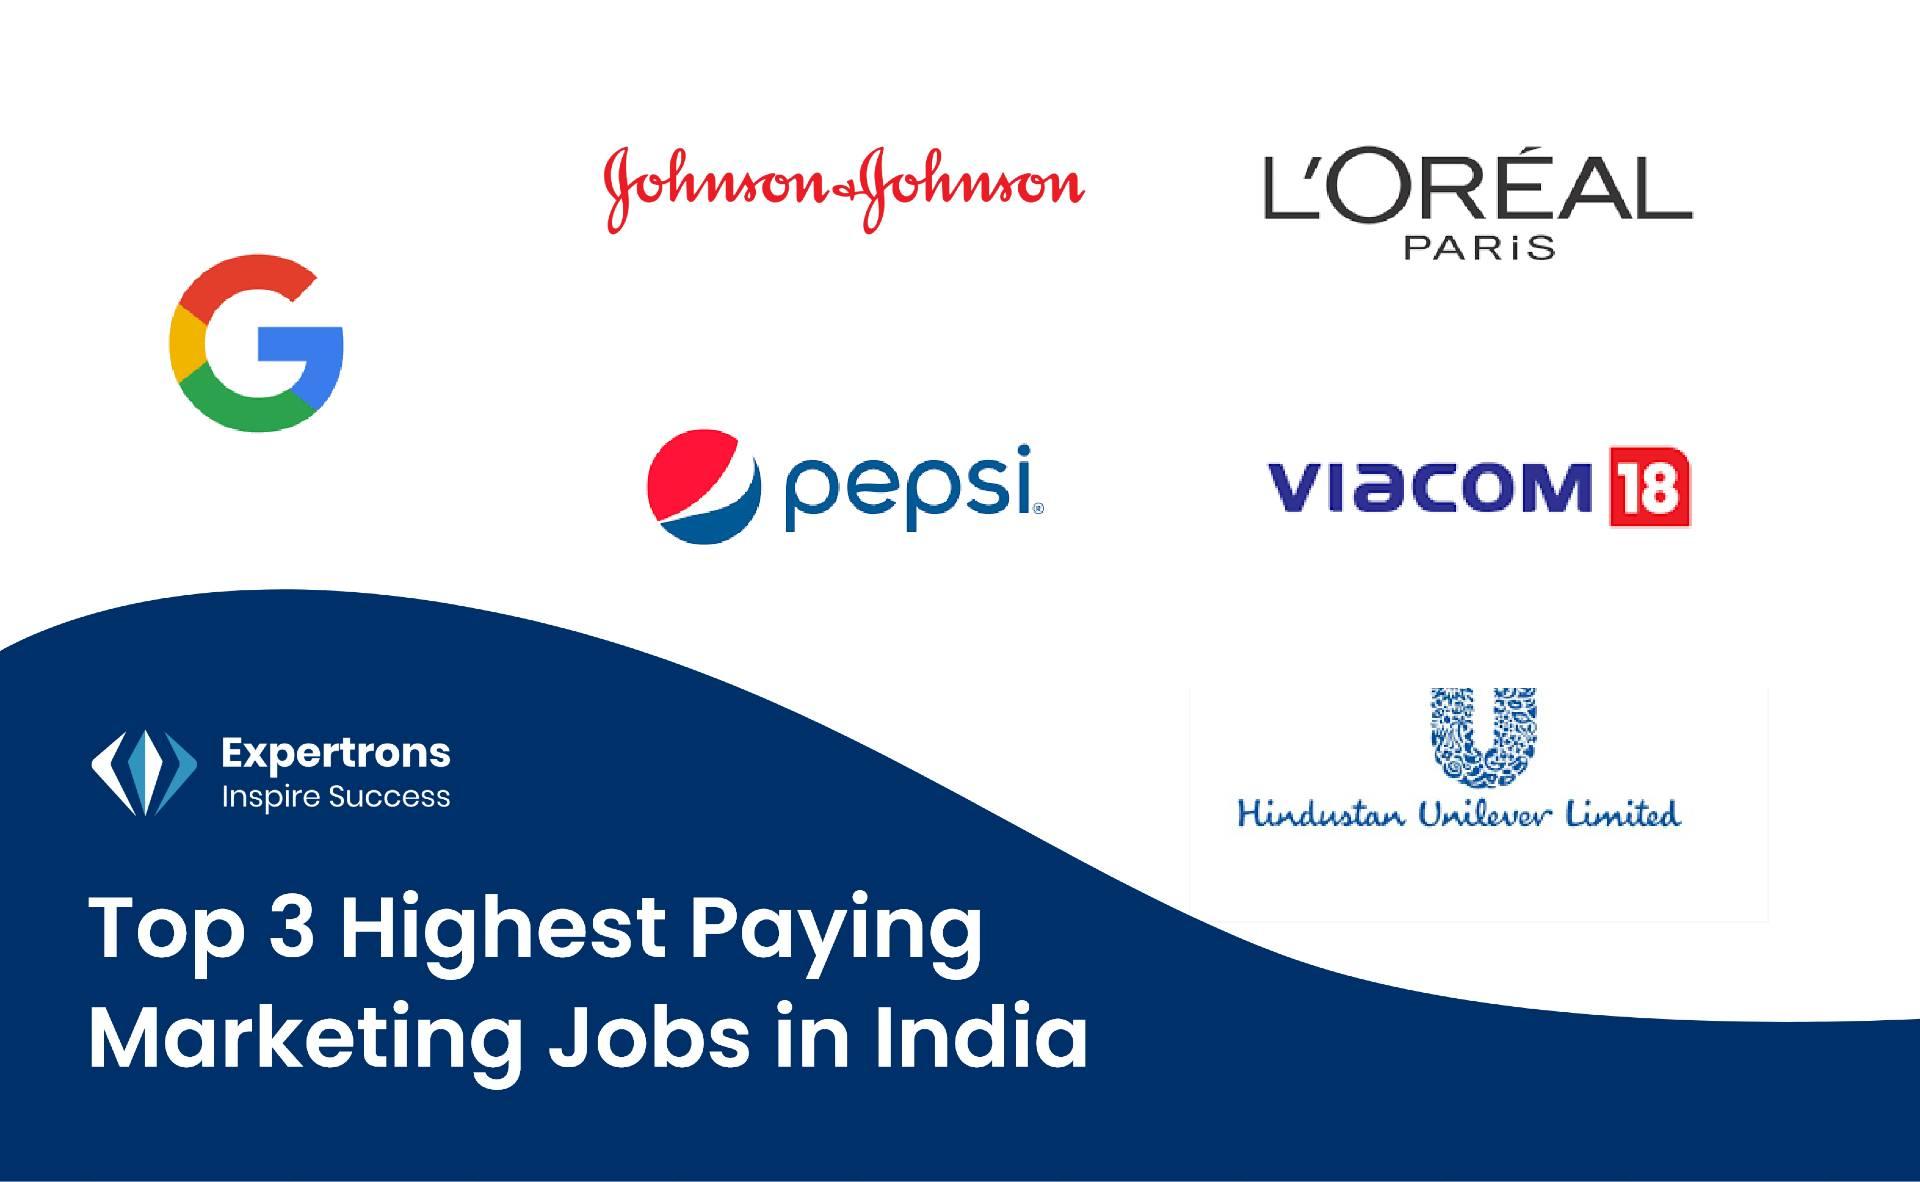 Marketing Jobs, 3 Highest Paying Marketing Jobs